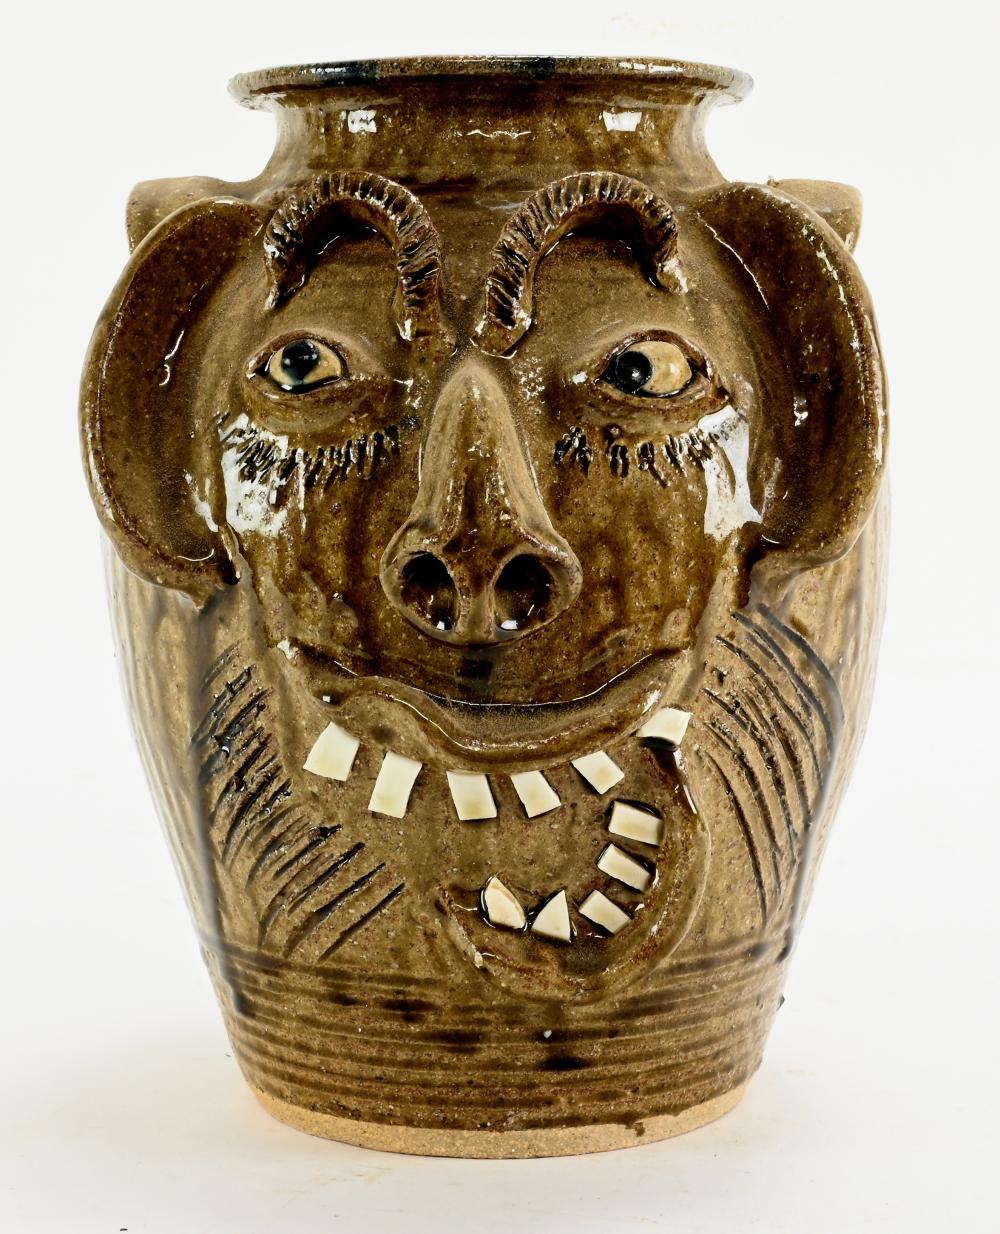 Charles Lisk Vale N.C. Pottery Face Churn